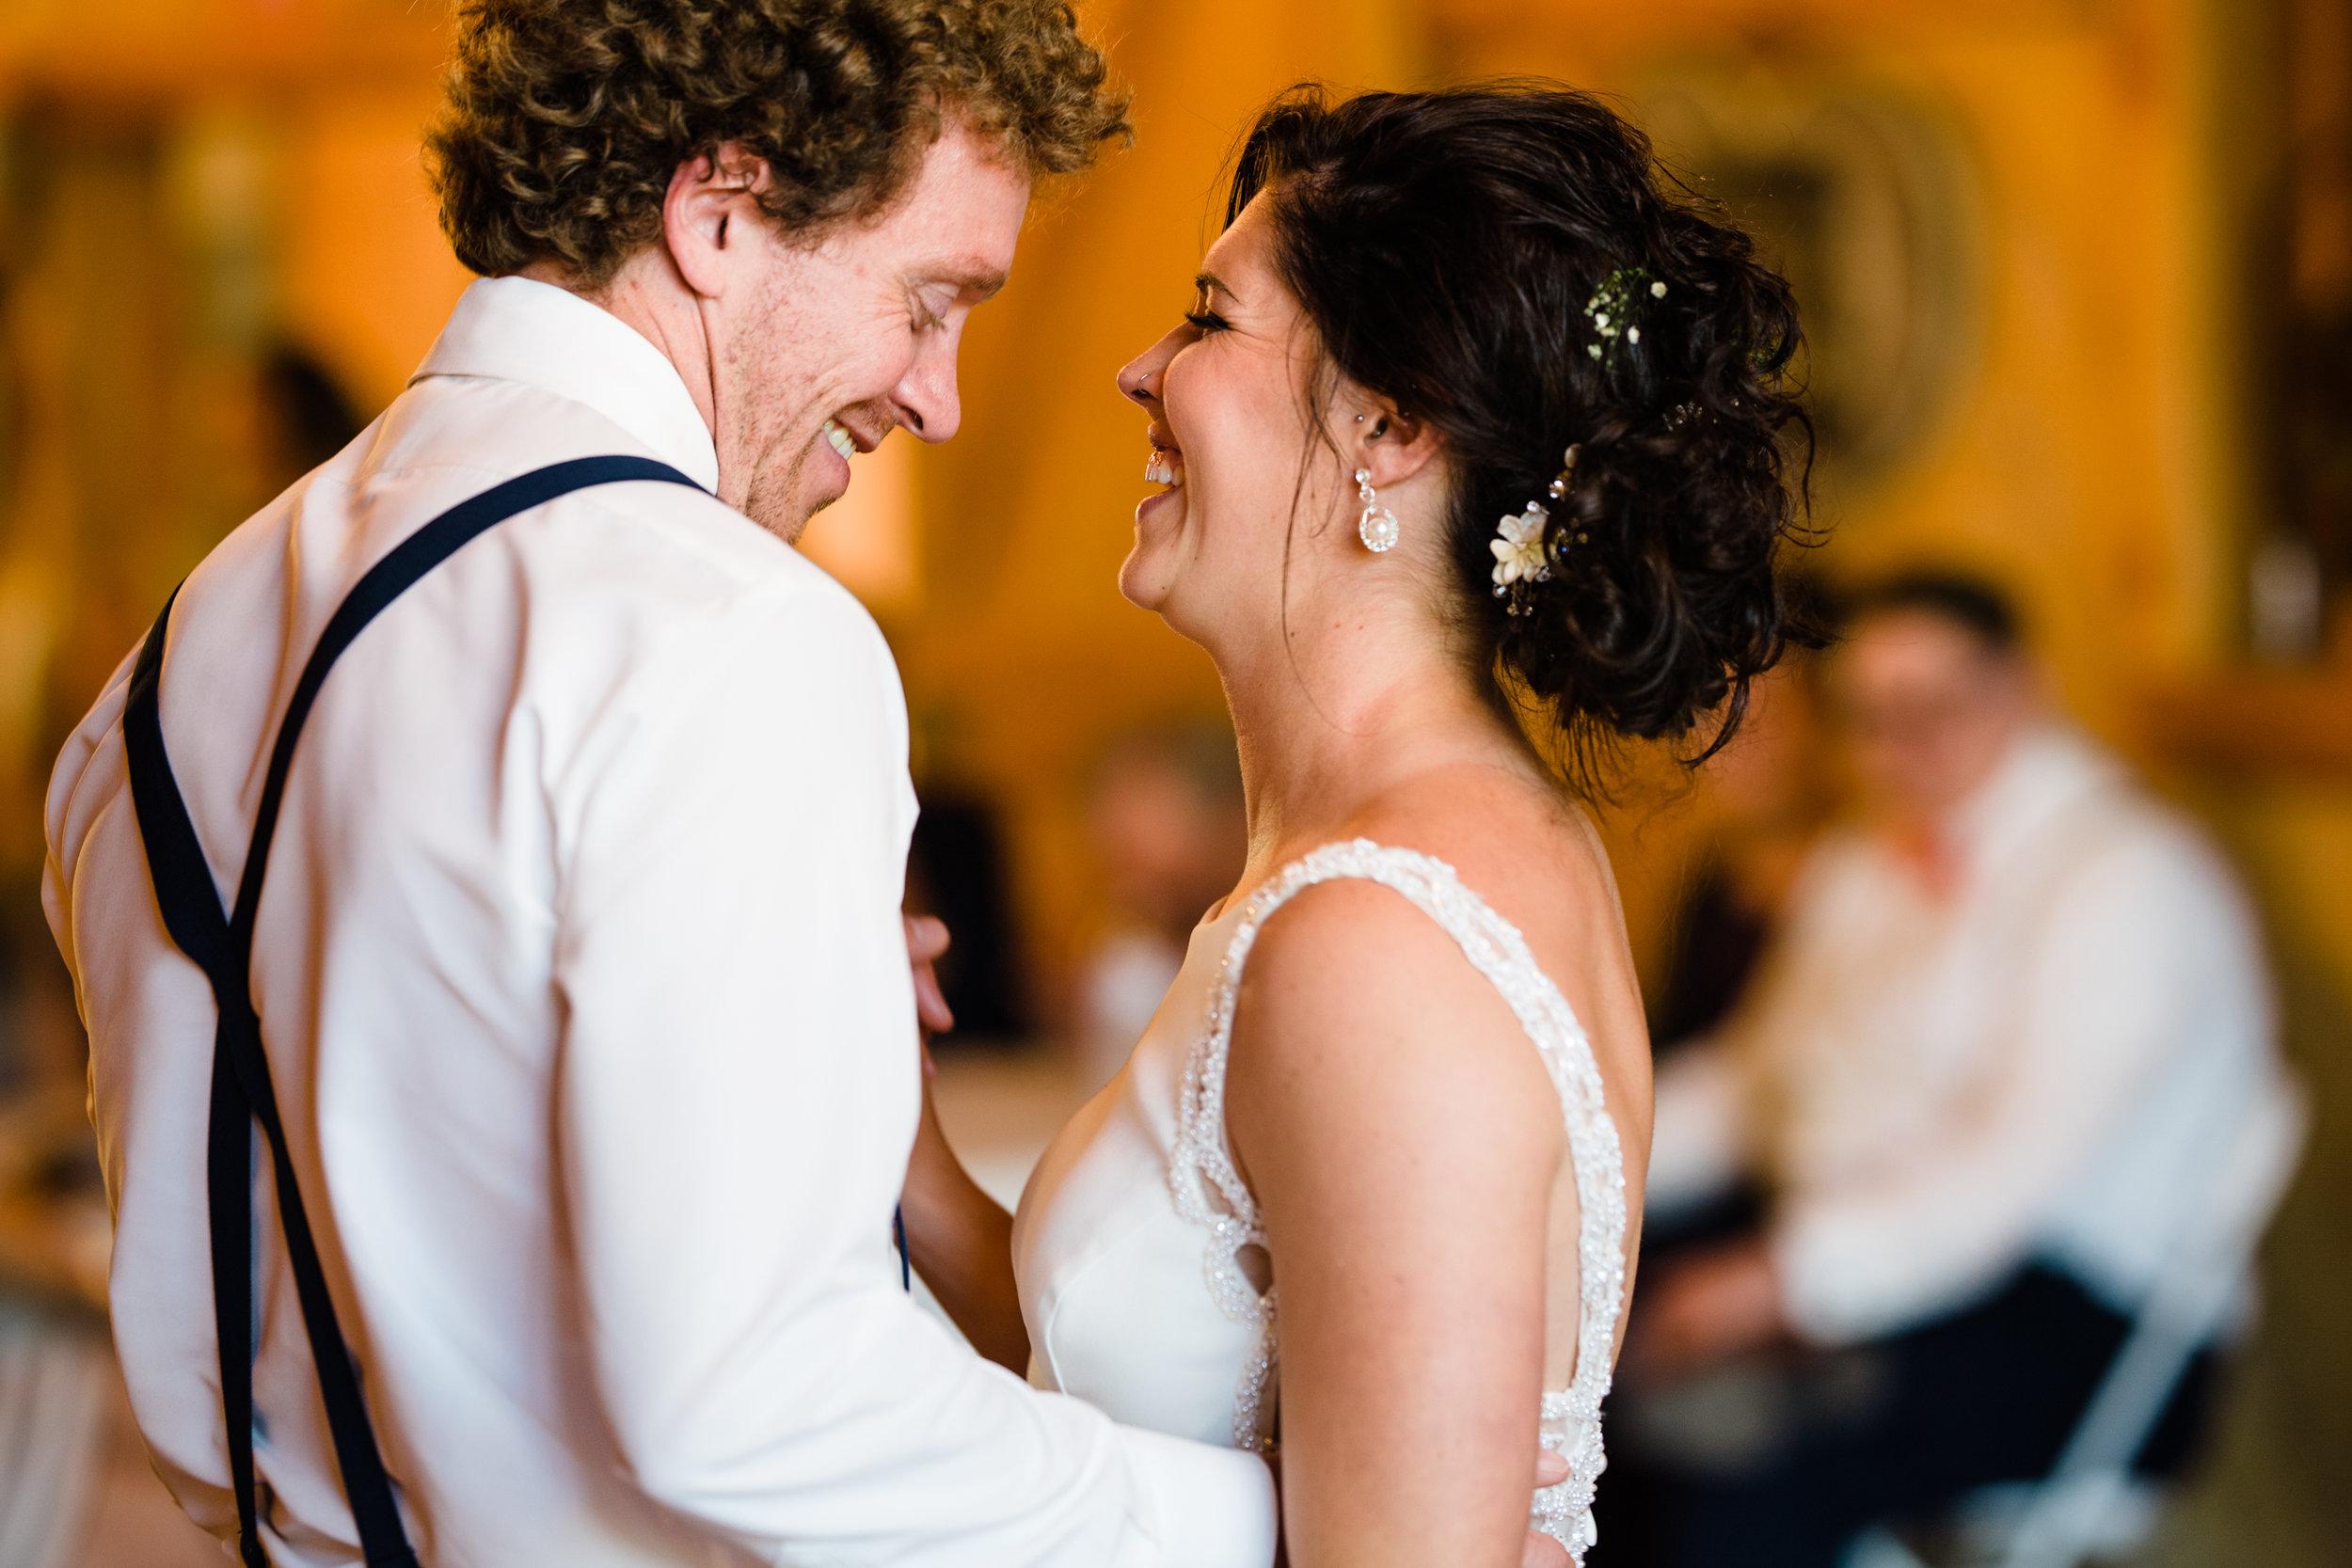 387The Barn at Finley Point Wedding_Montana Wedding Photographer_Katy & Bryce_July 20, 2019-637.jpg